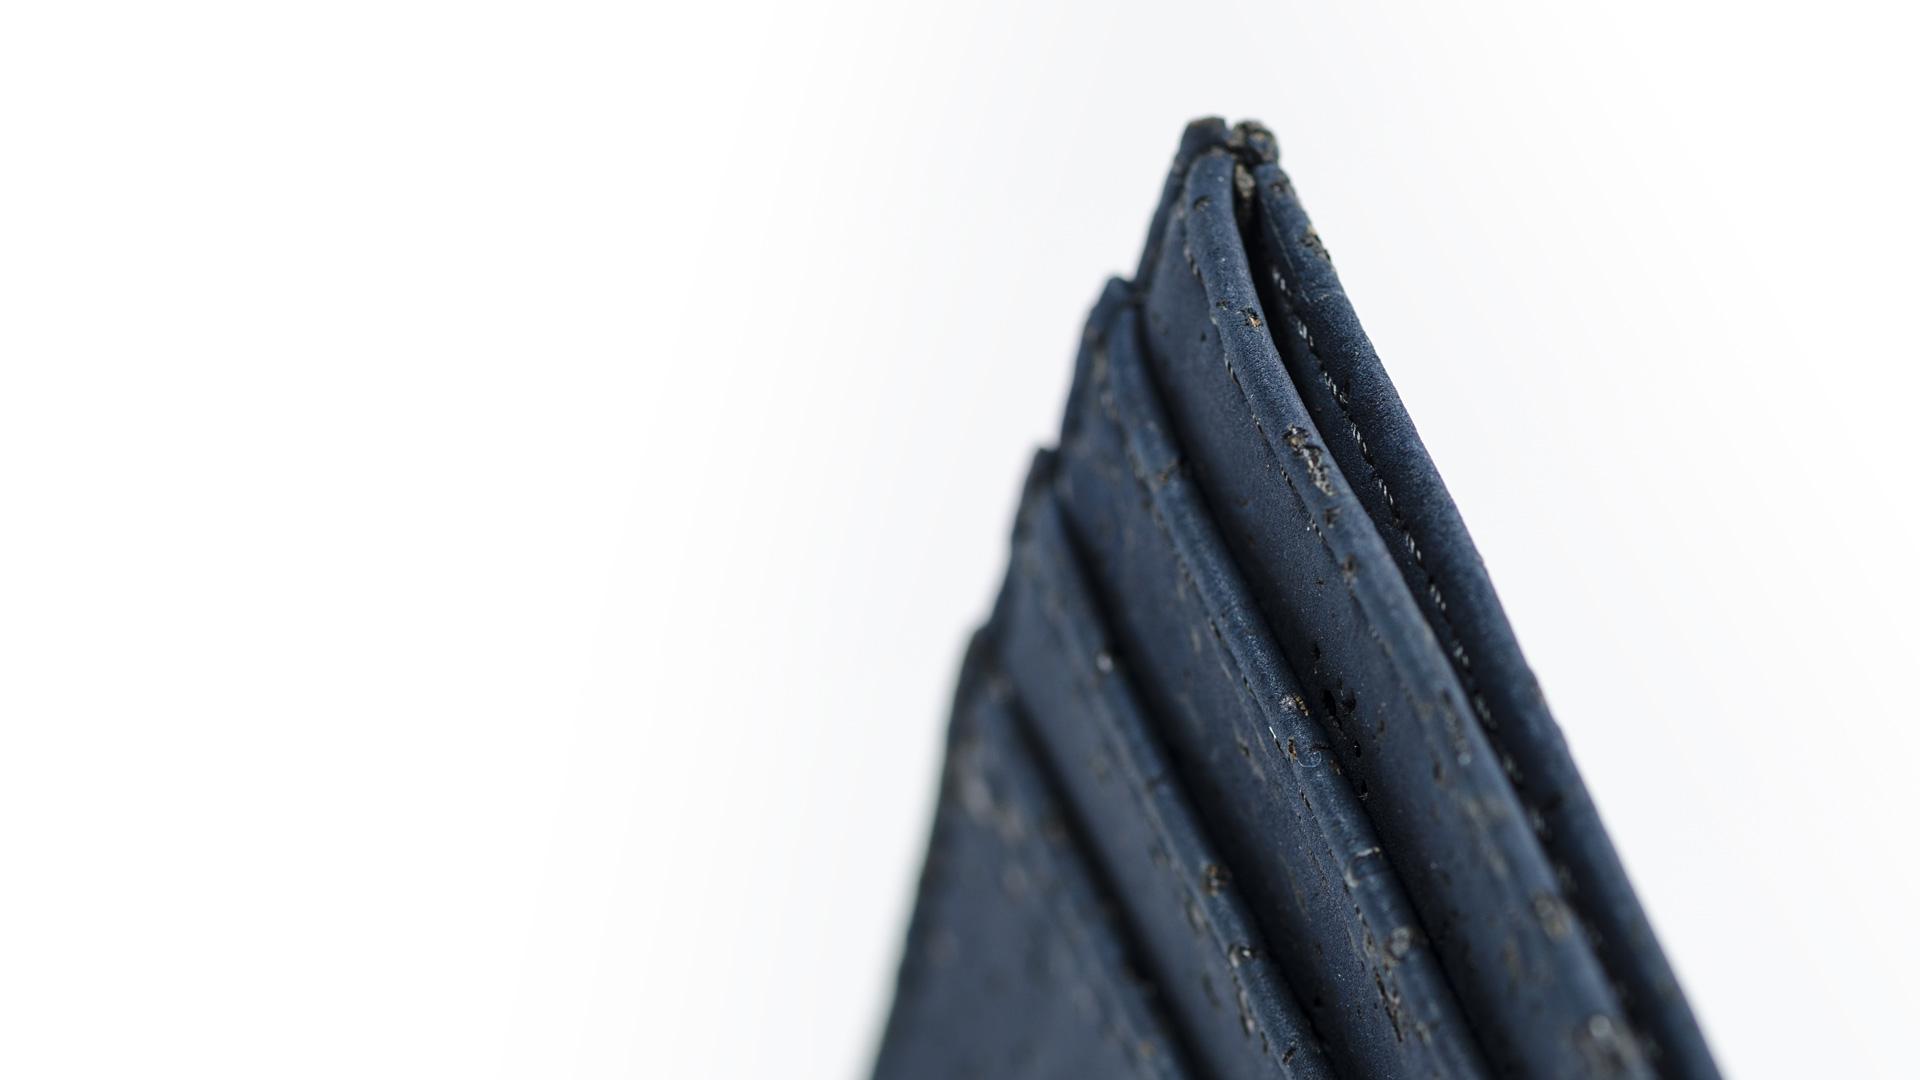 Korkportemonnaie, Kork Portemonnaie Card Holder,Navy Blue, editorial